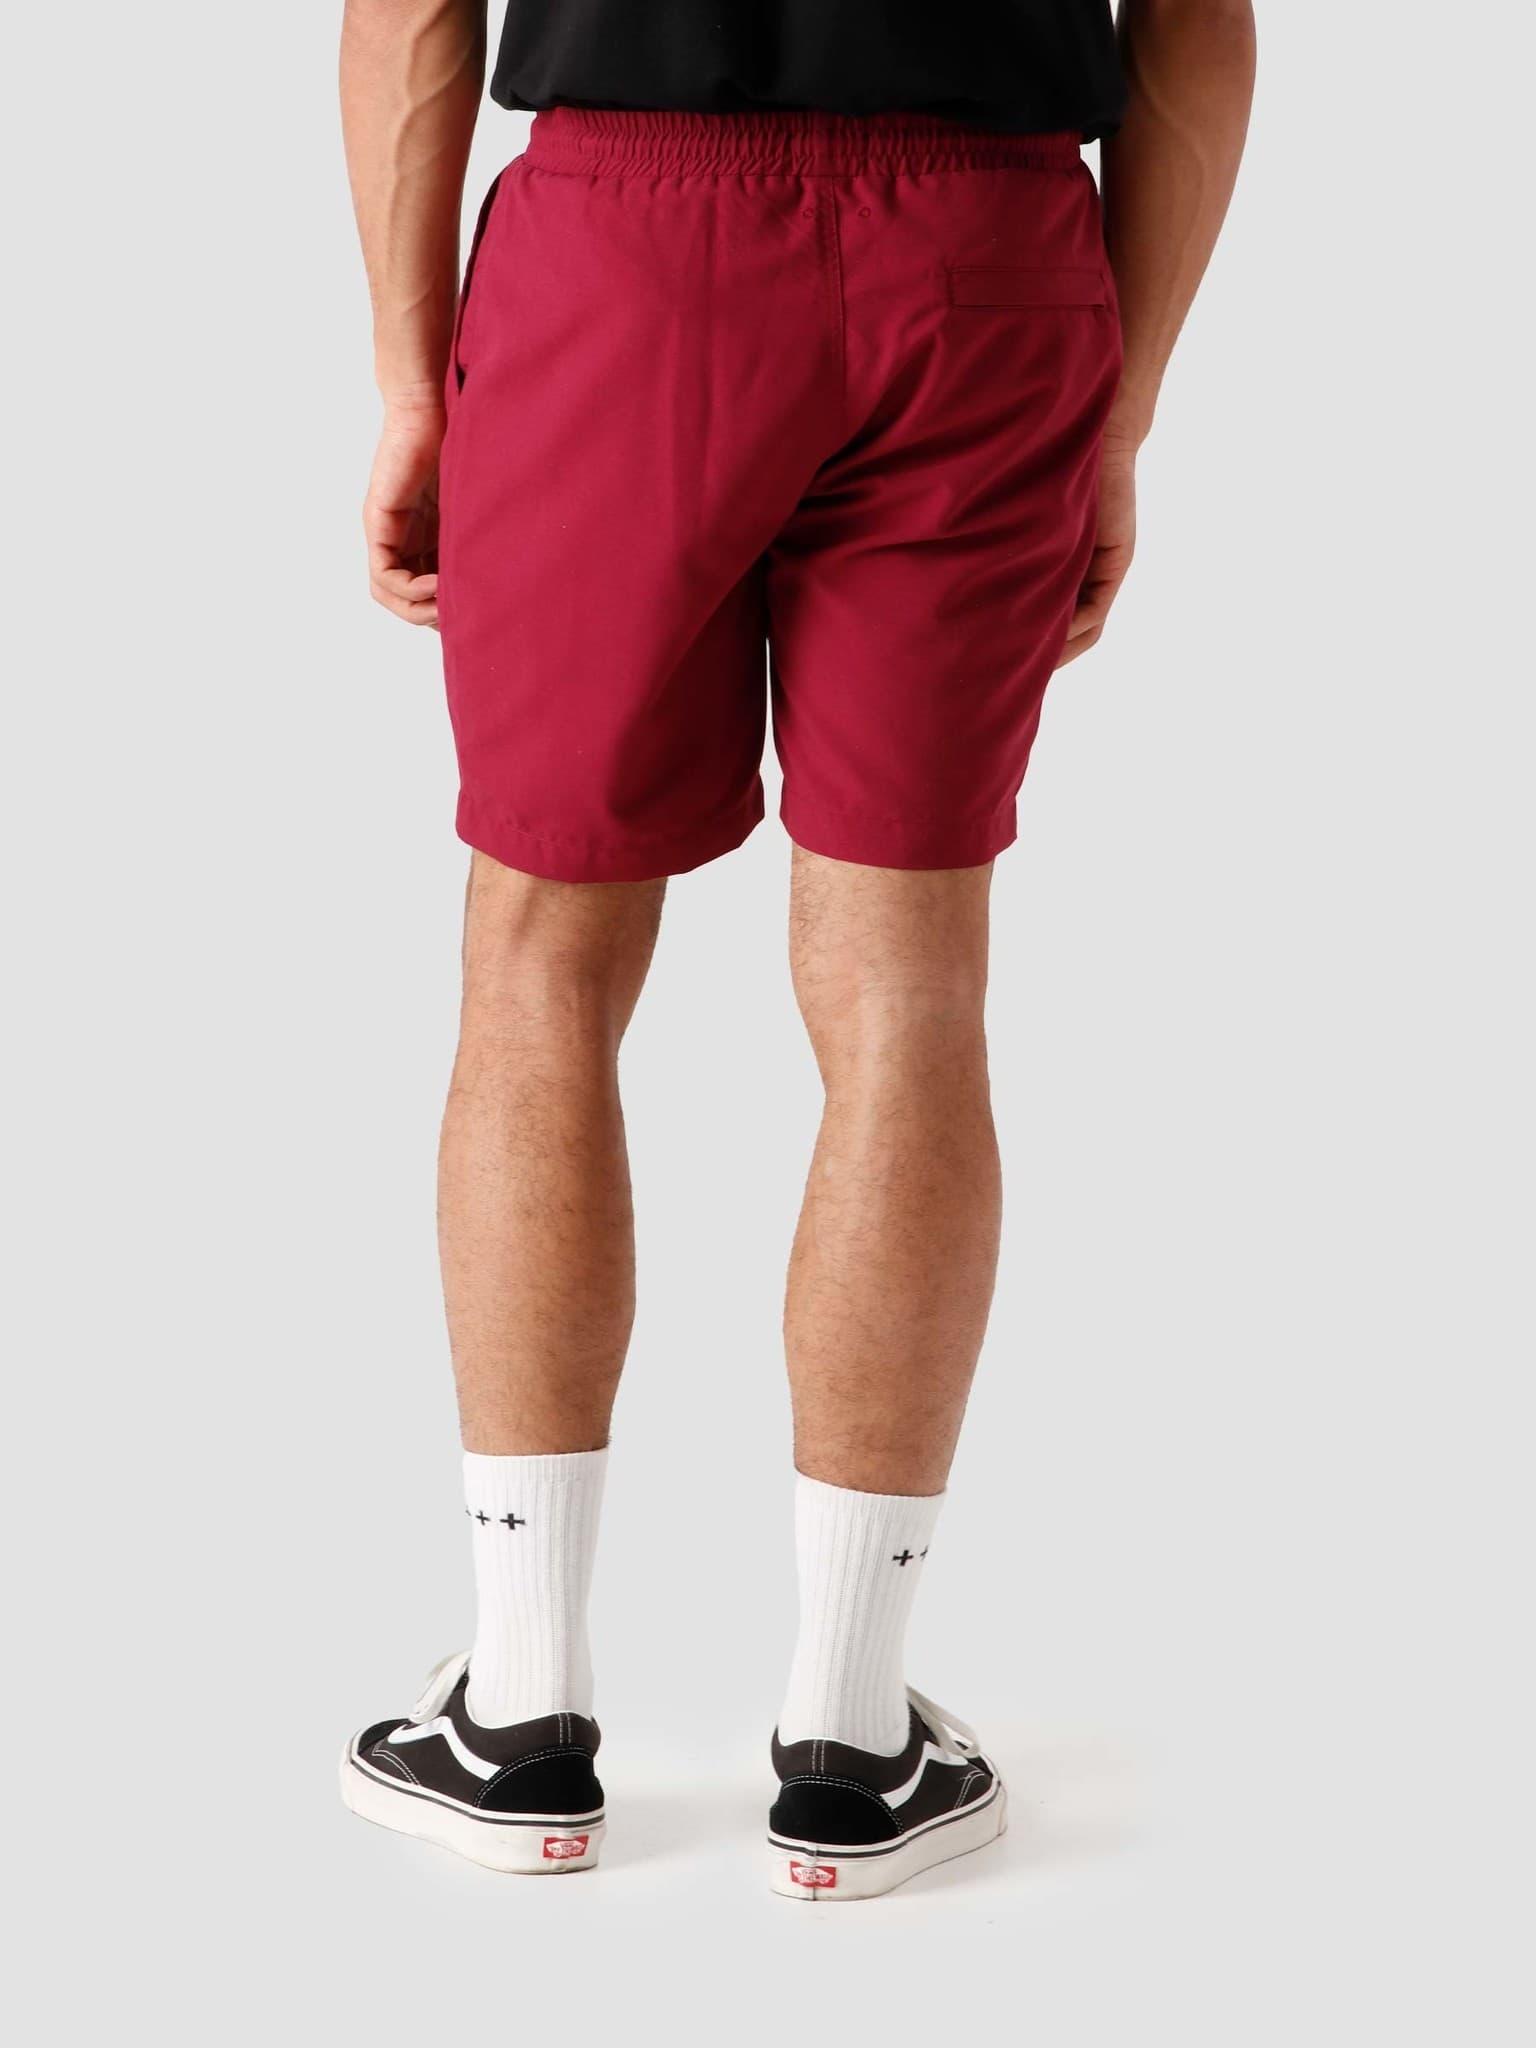 QB35 Technical Shorts Berry